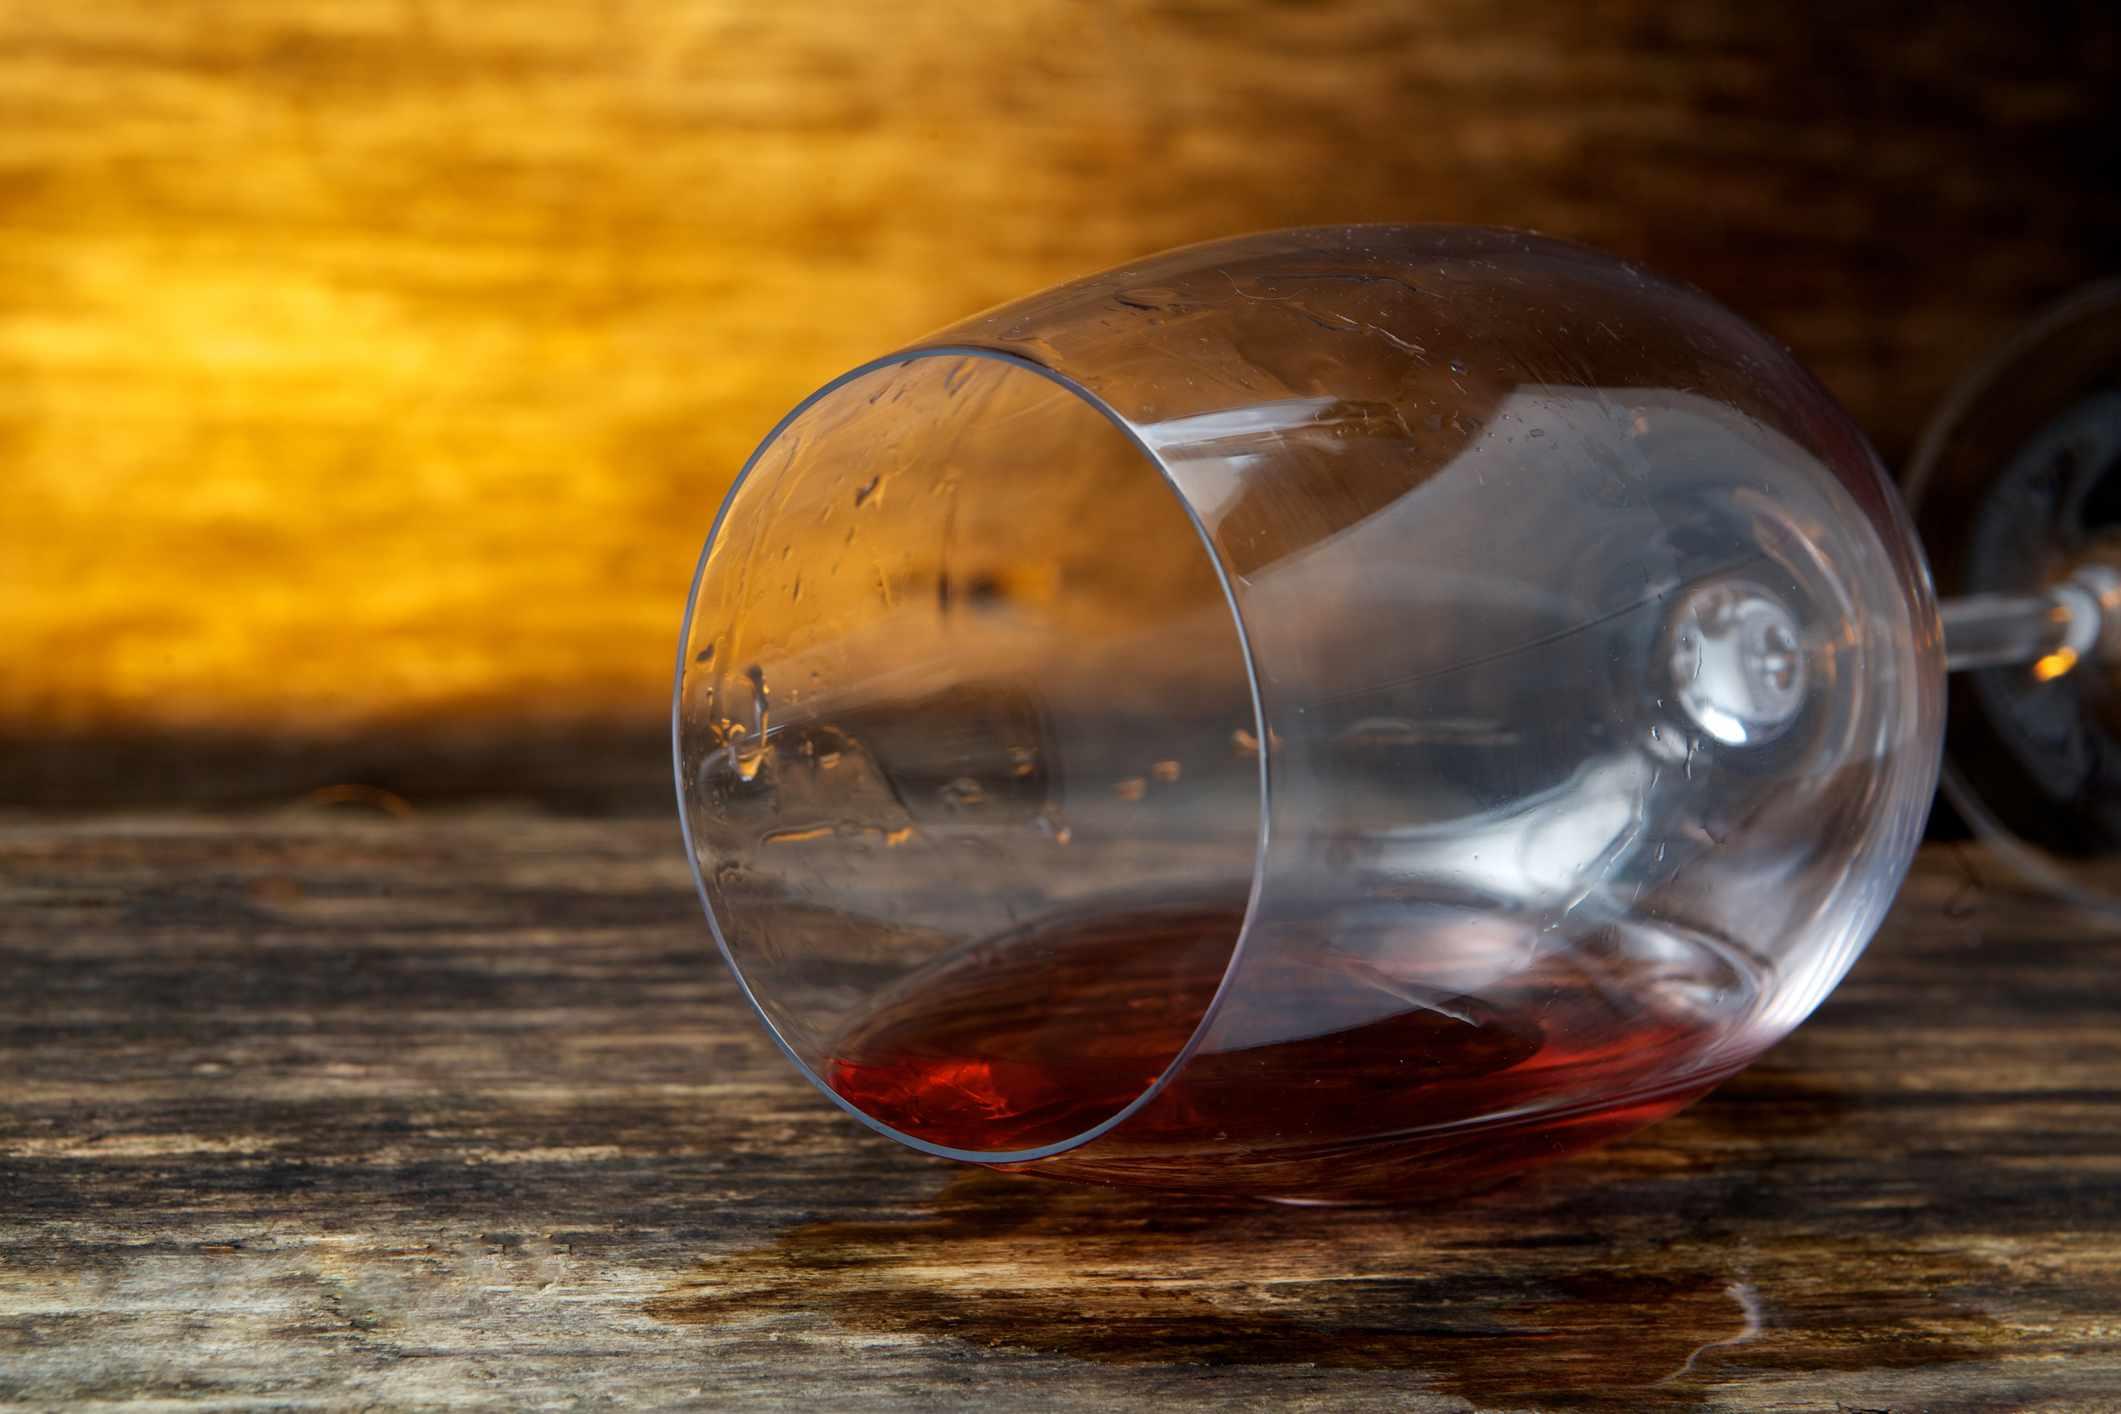 C mo quitar las manchas de vino kirby - Como quitar manchas de lejia ...